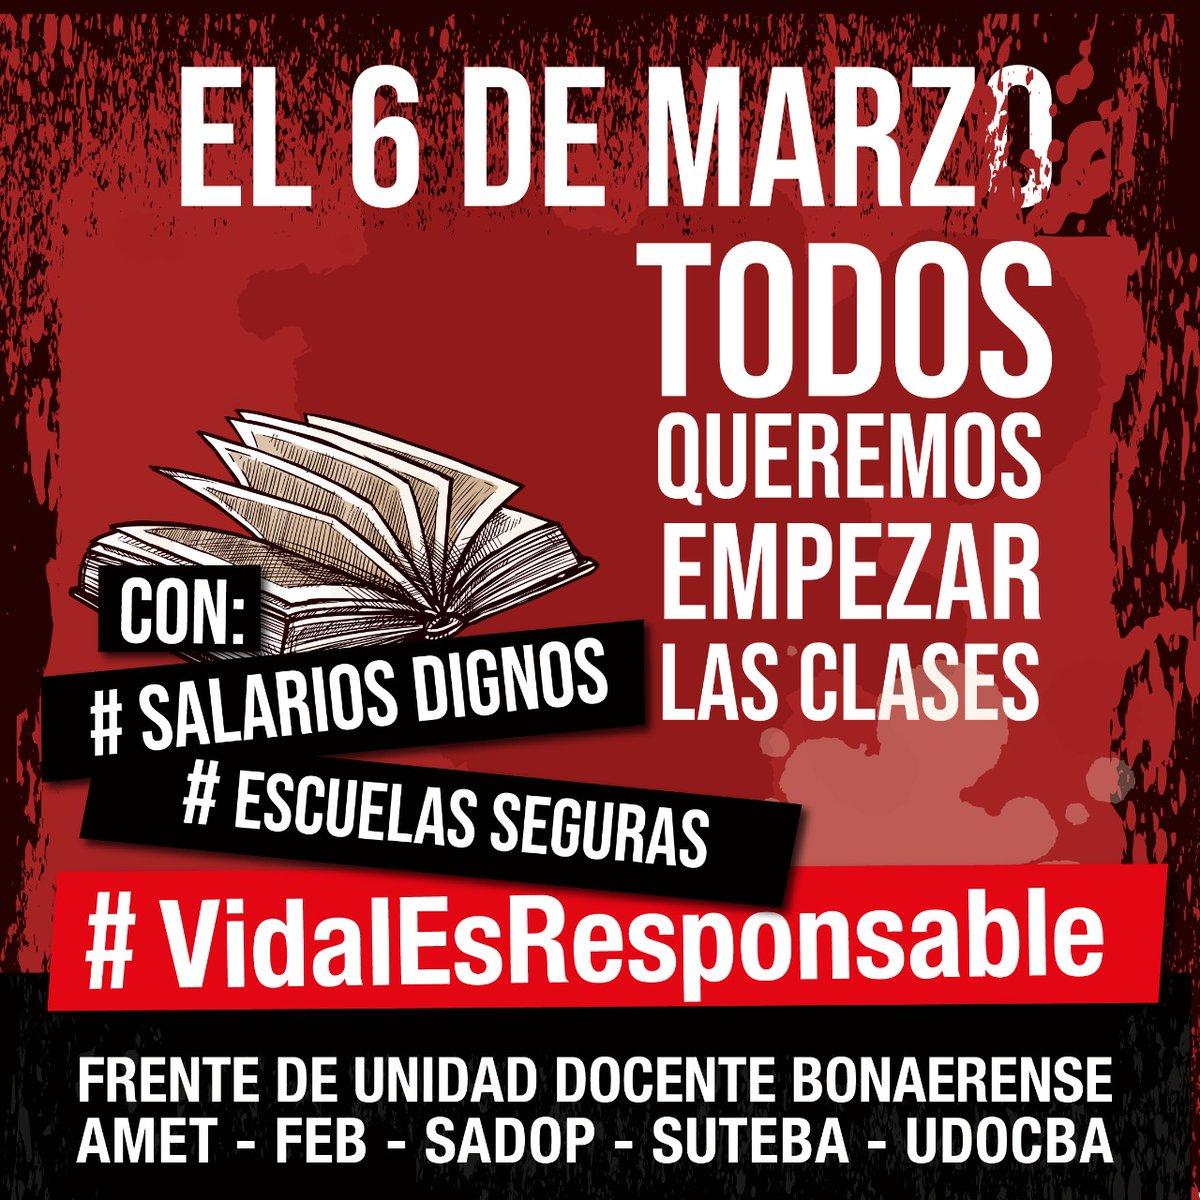 Udocba E.de la Cruz's photo on #SalariosDignos